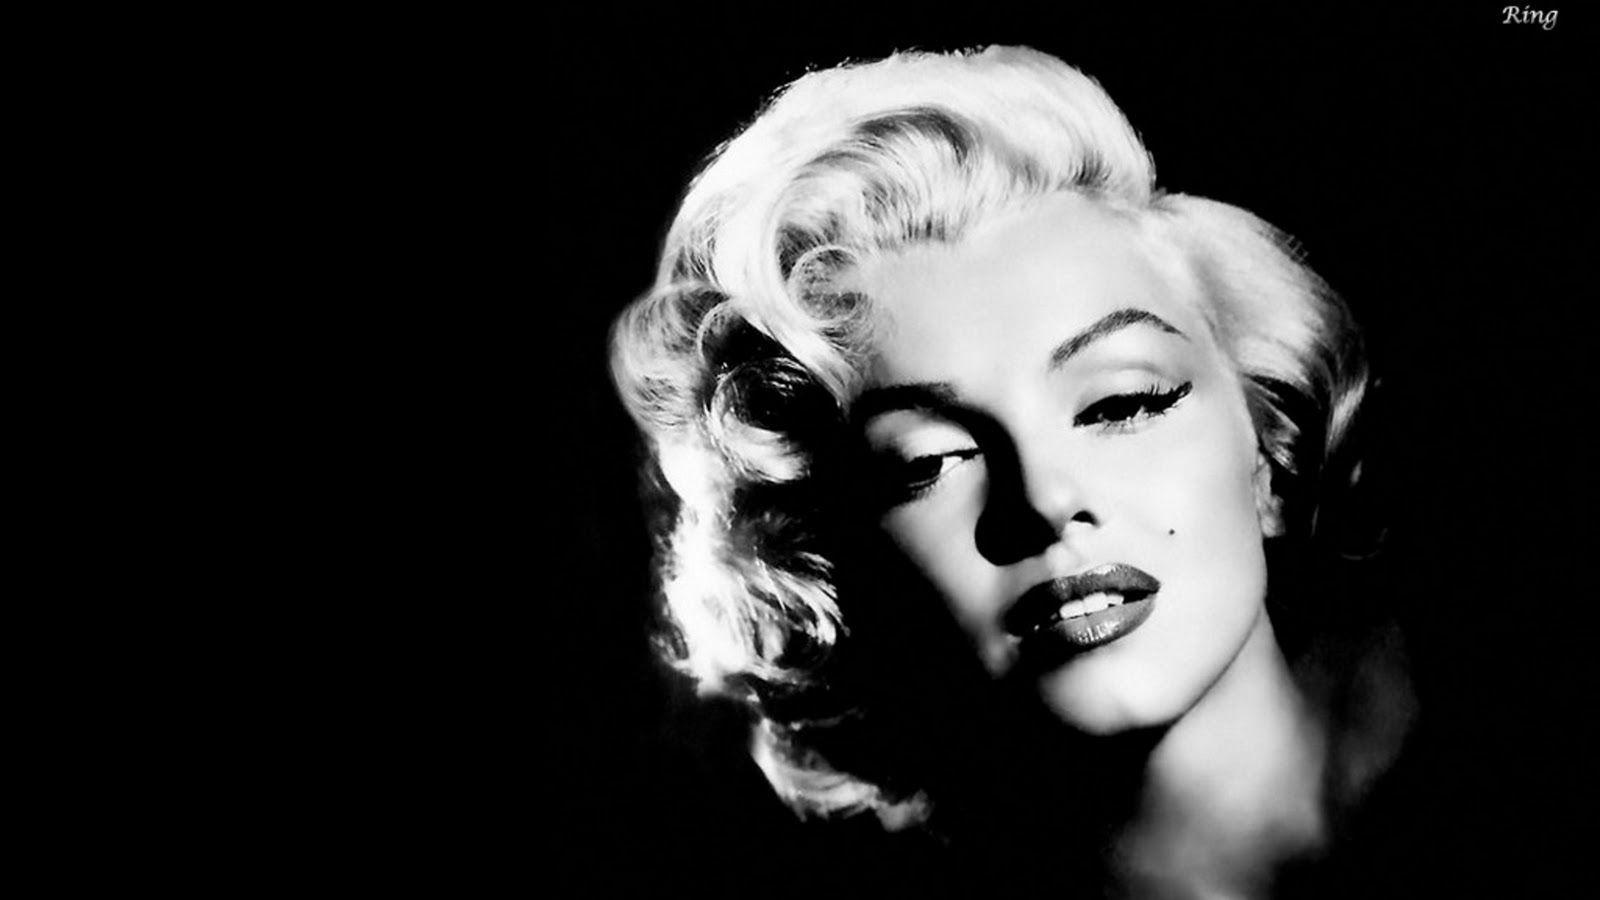 Beautiful Marilyn Monroe Wallpaper HD #20913 Wallpaper | HDwallsize.